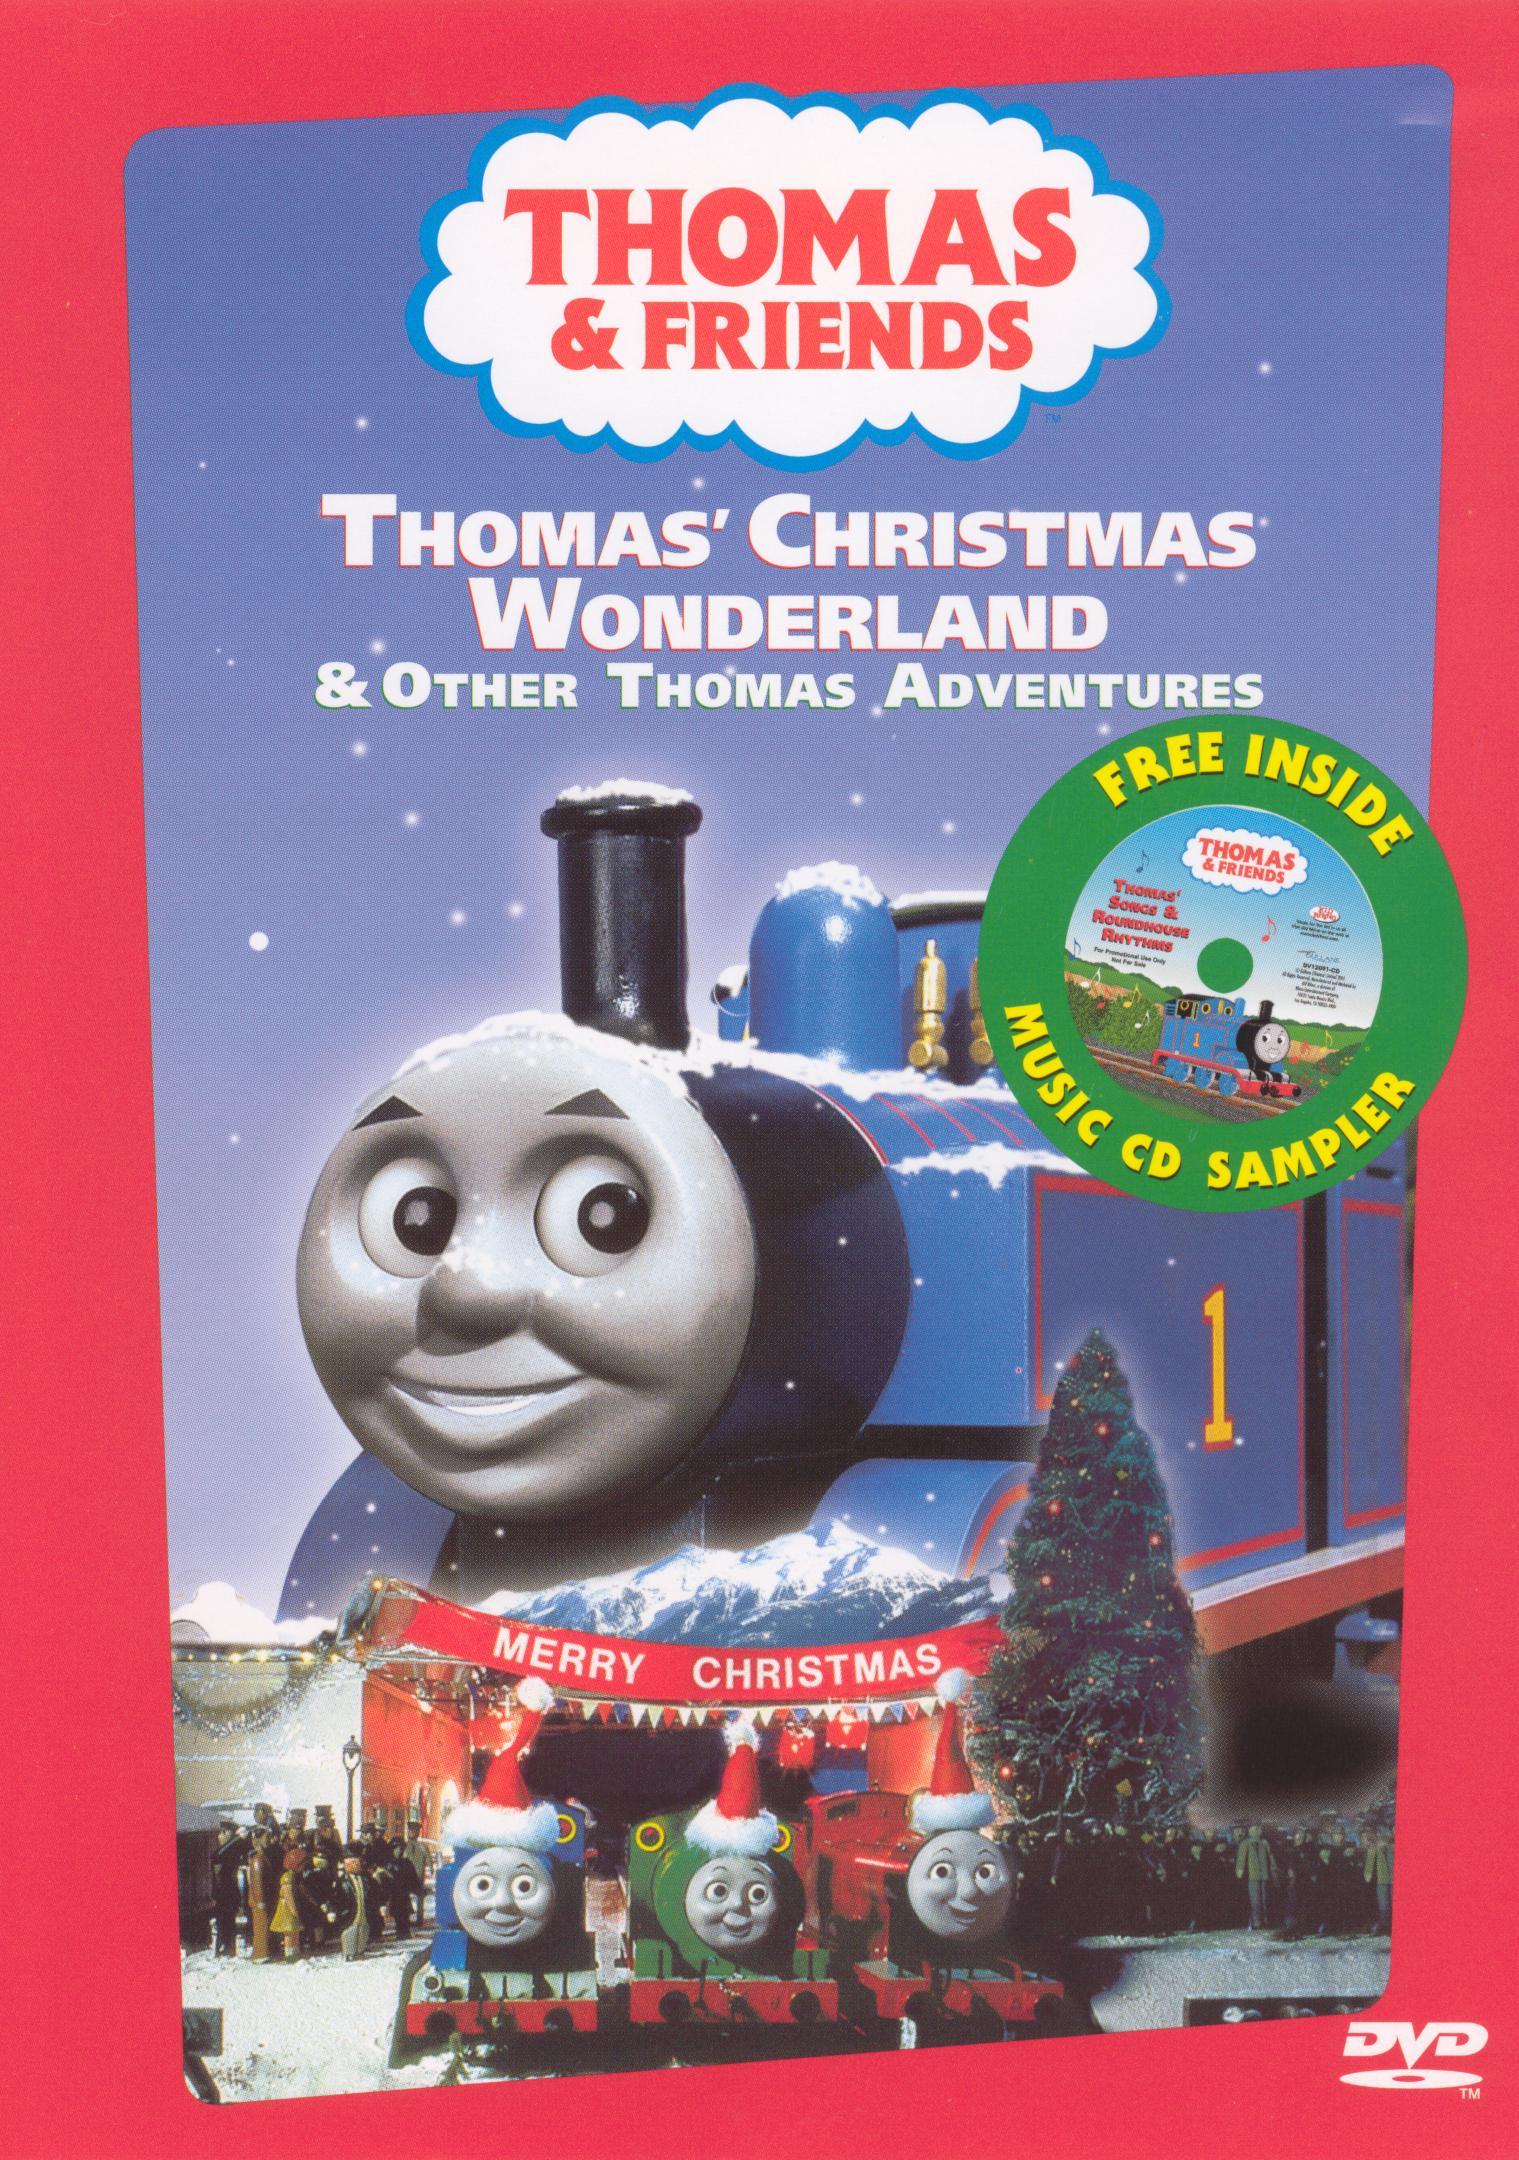 Thomas Christmas Wonderland Vhs.Thomas Christmas Wonderland And Other Thomas Adventures